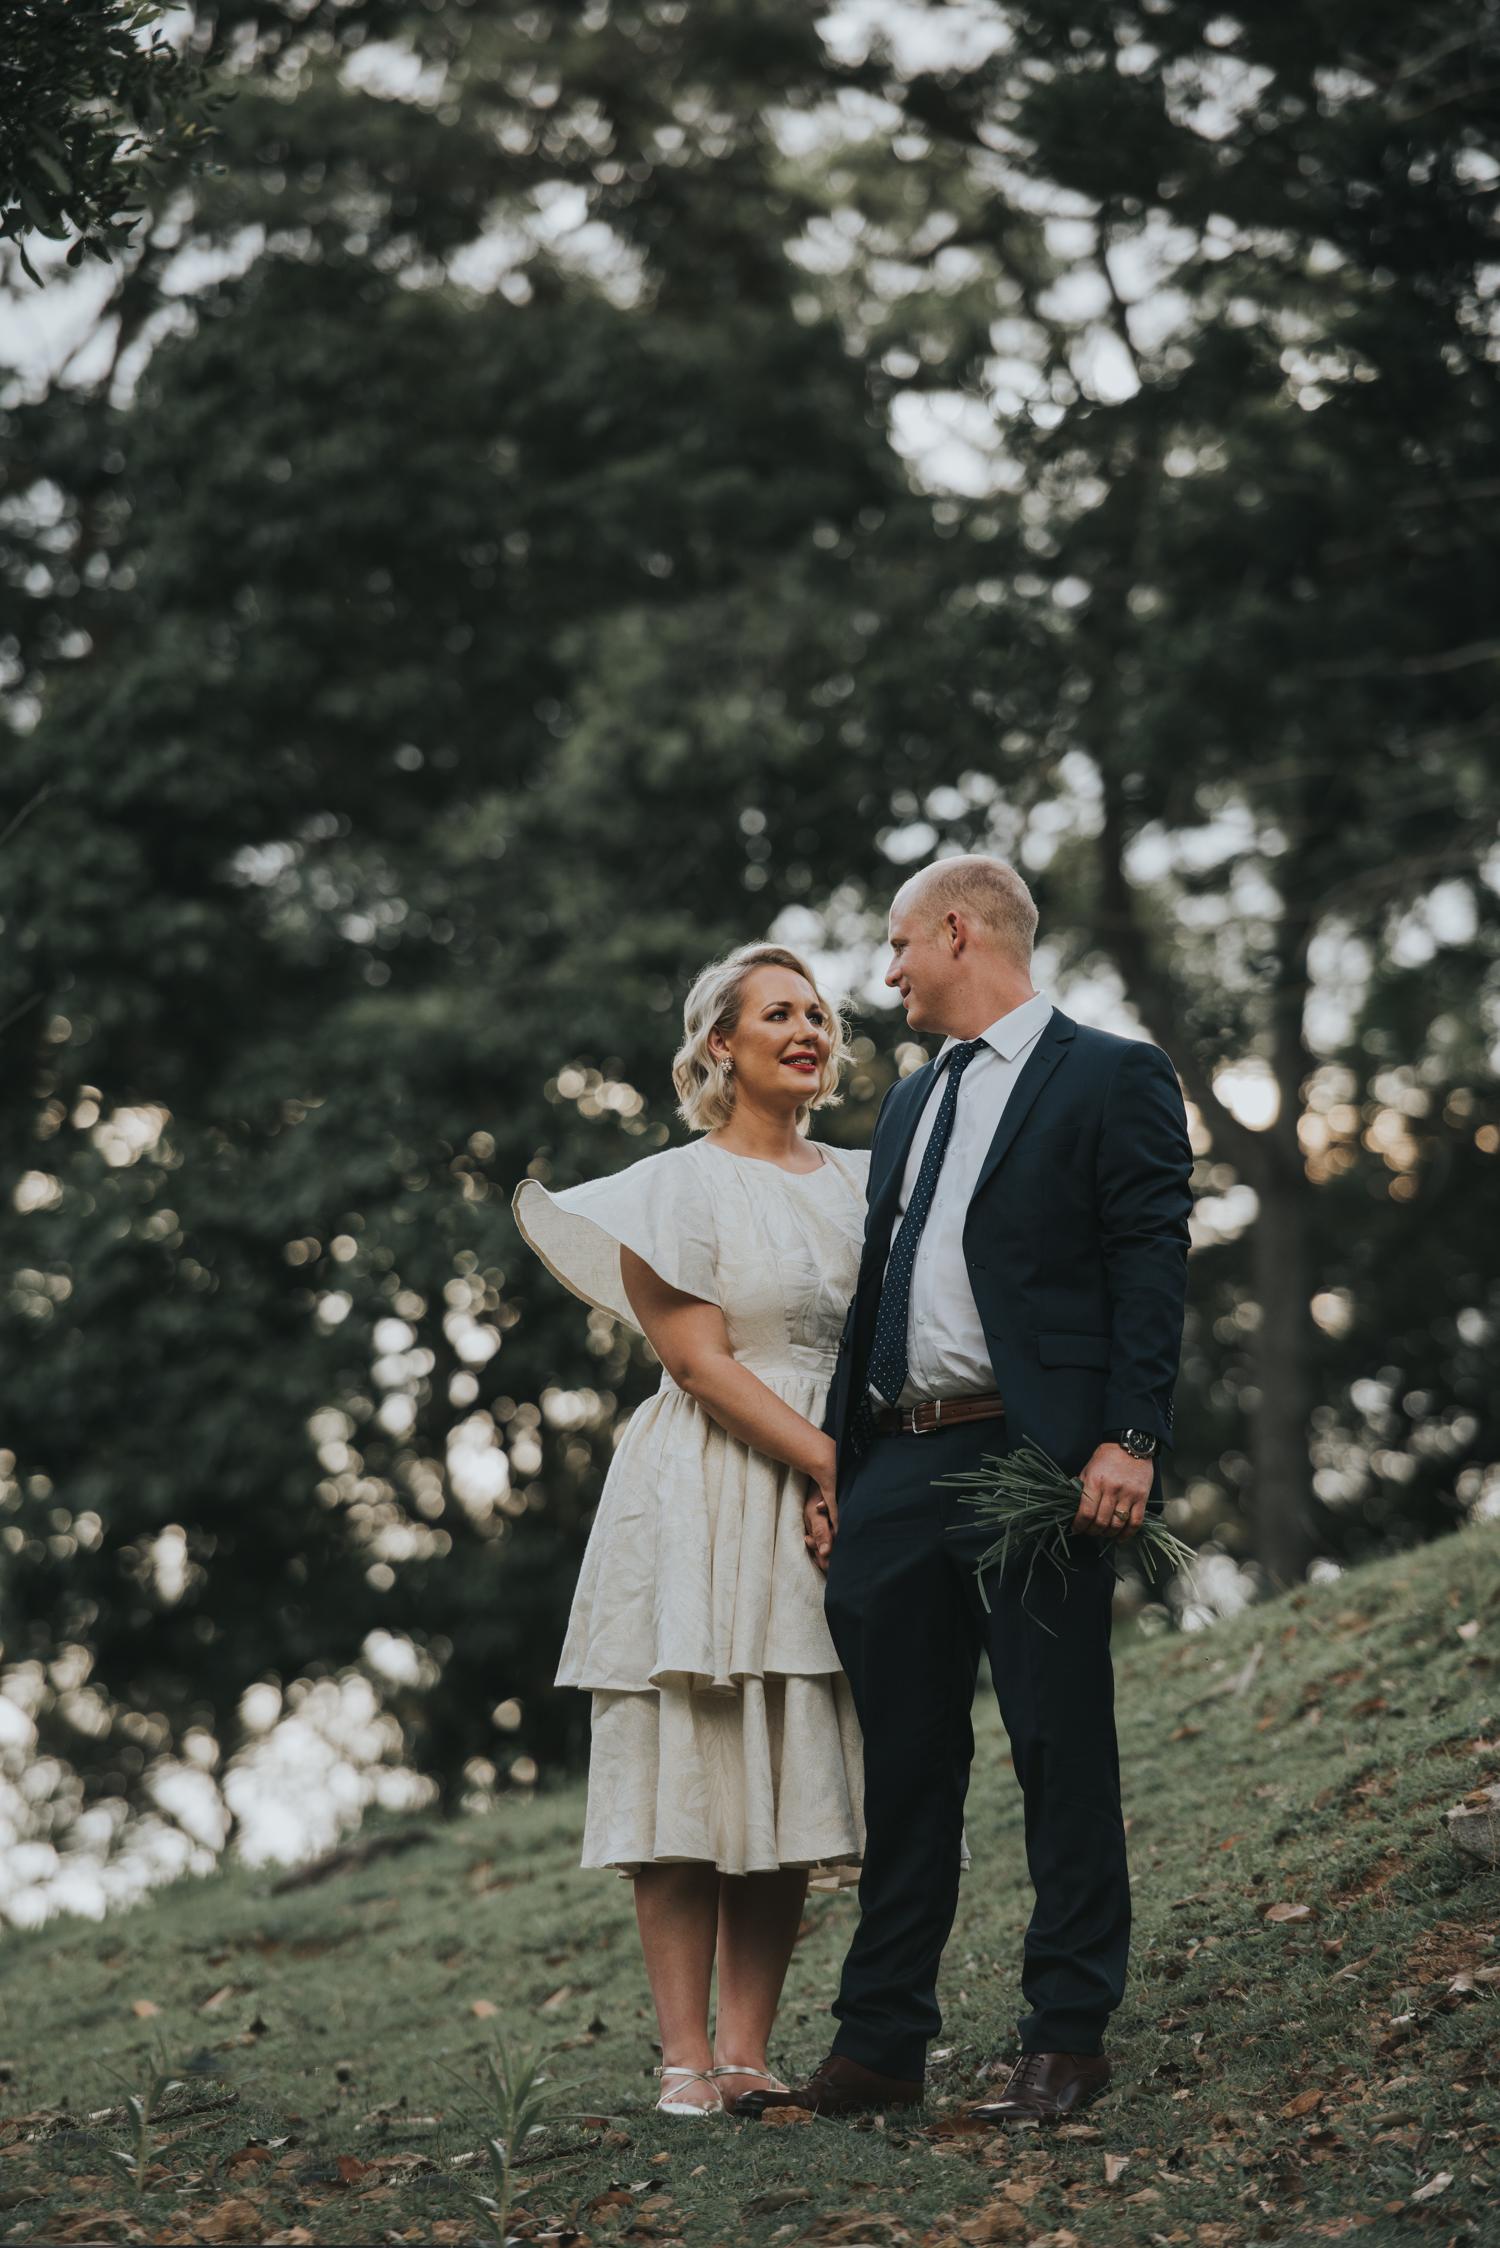 Brisbane Wedding Photographer | Mt Mee Wedding-59.jpg